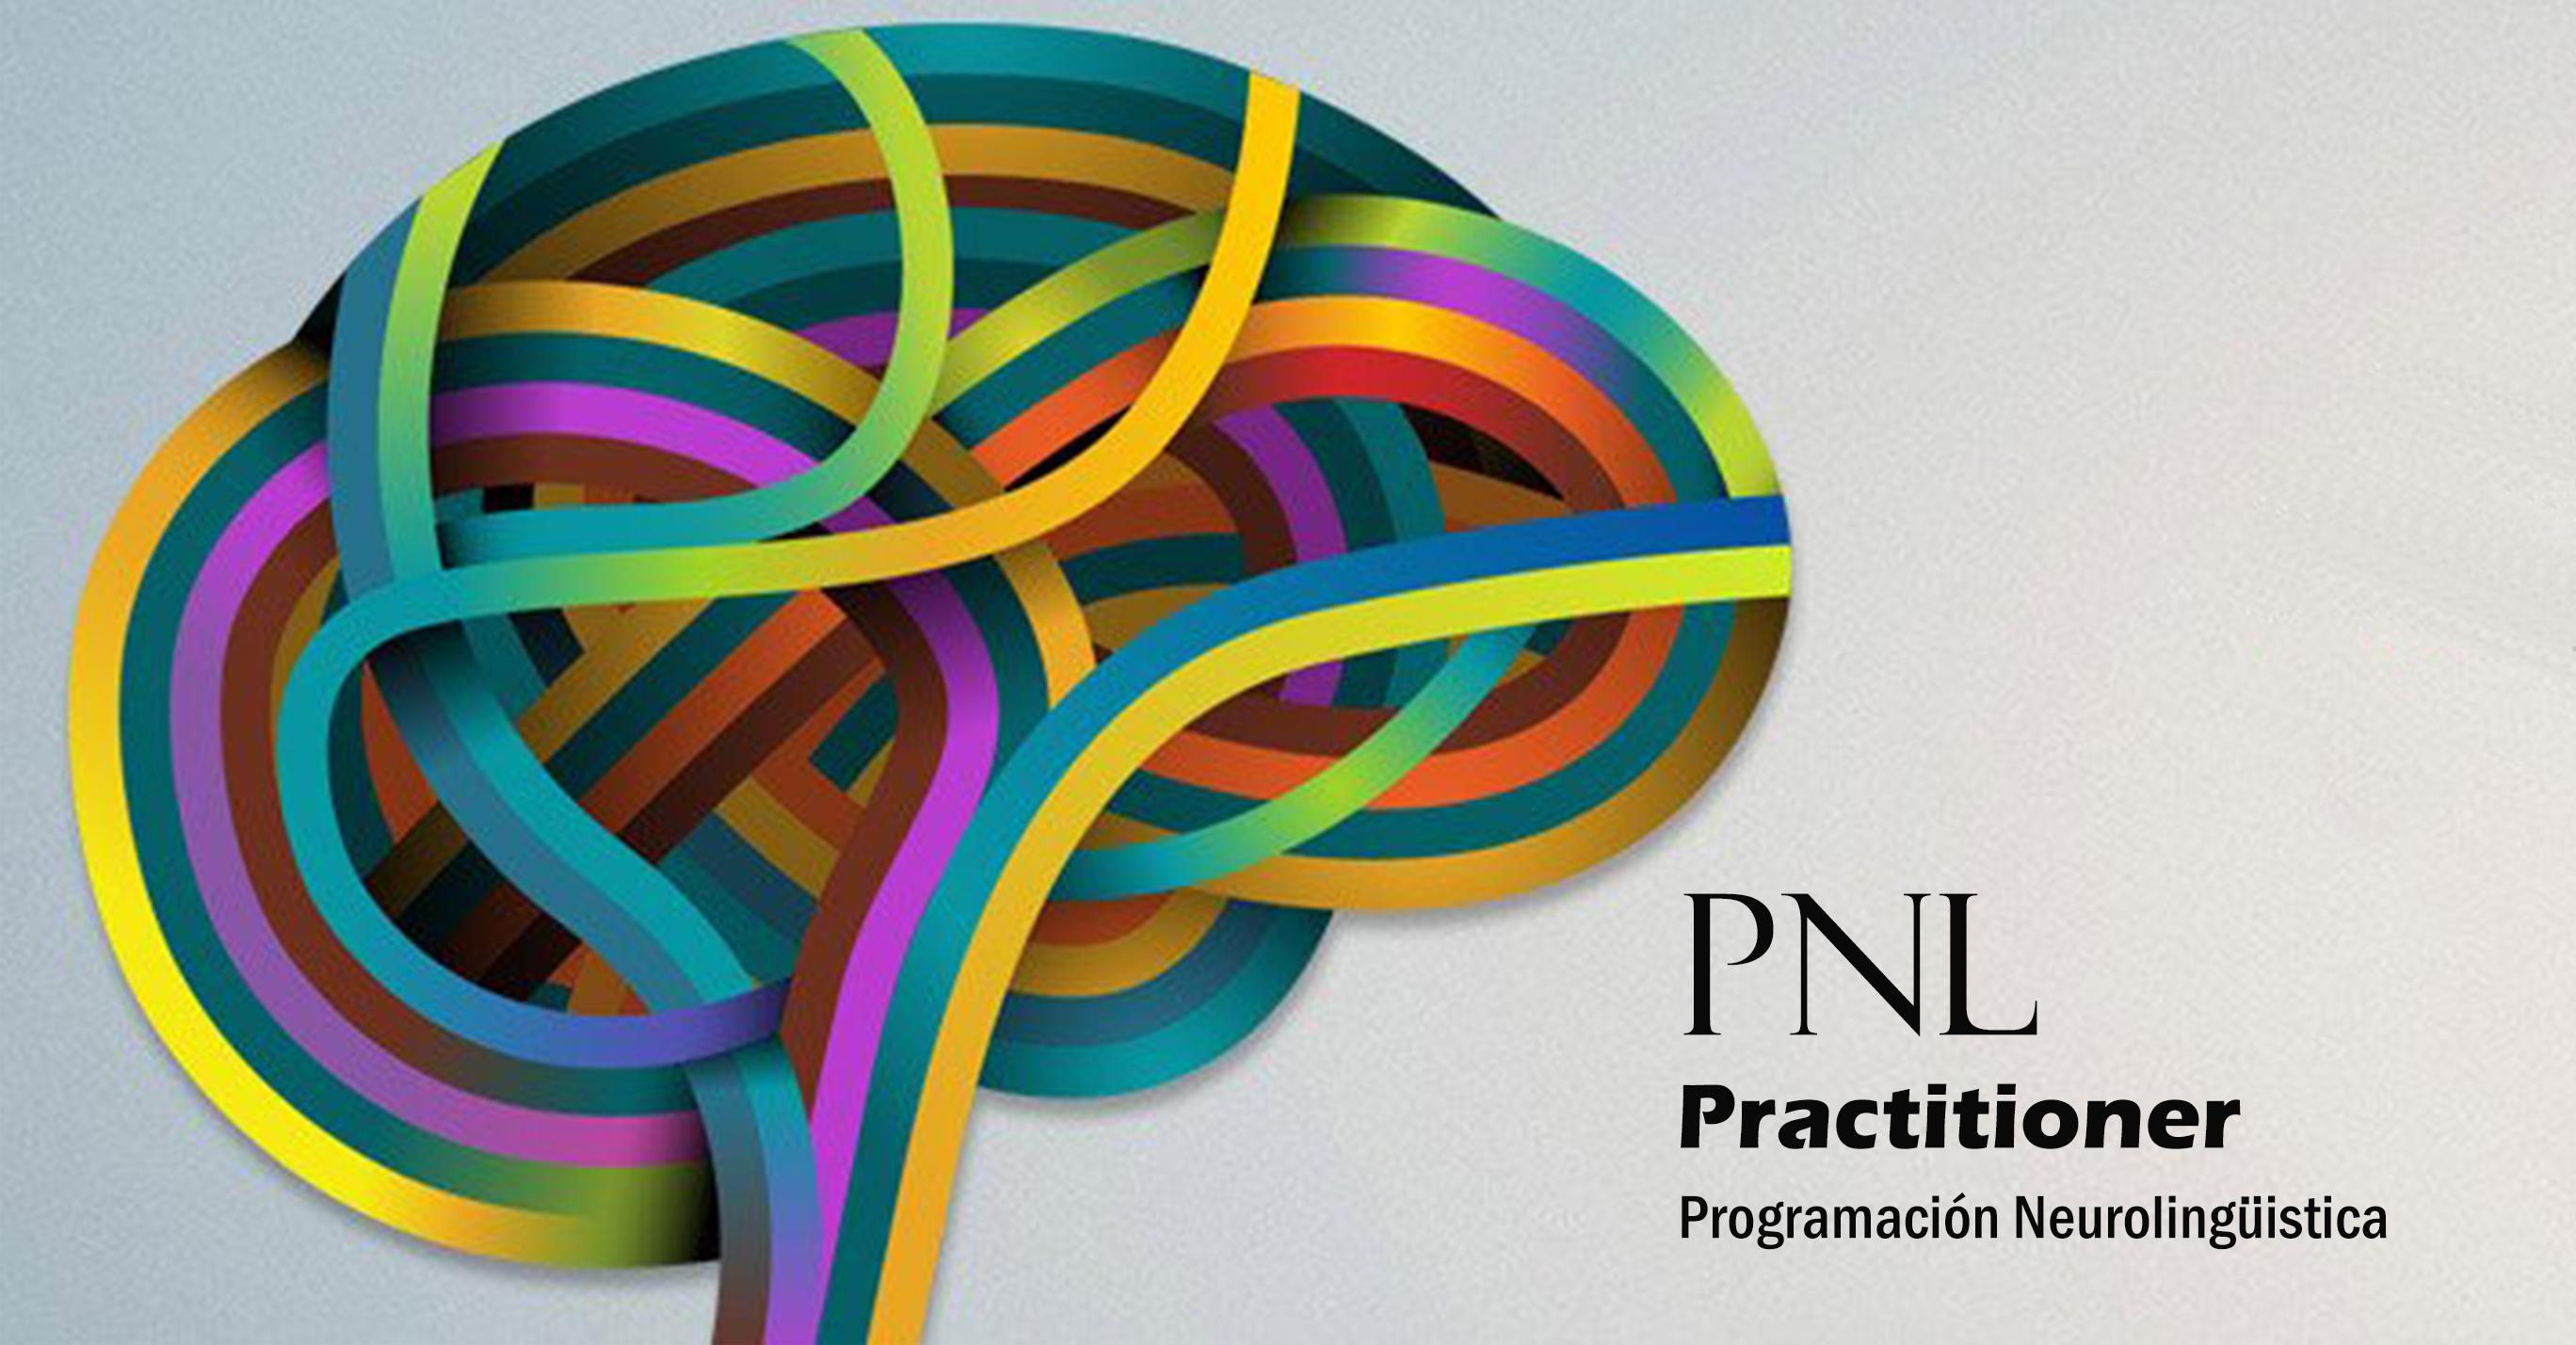 PNL PRACTITIONER 2